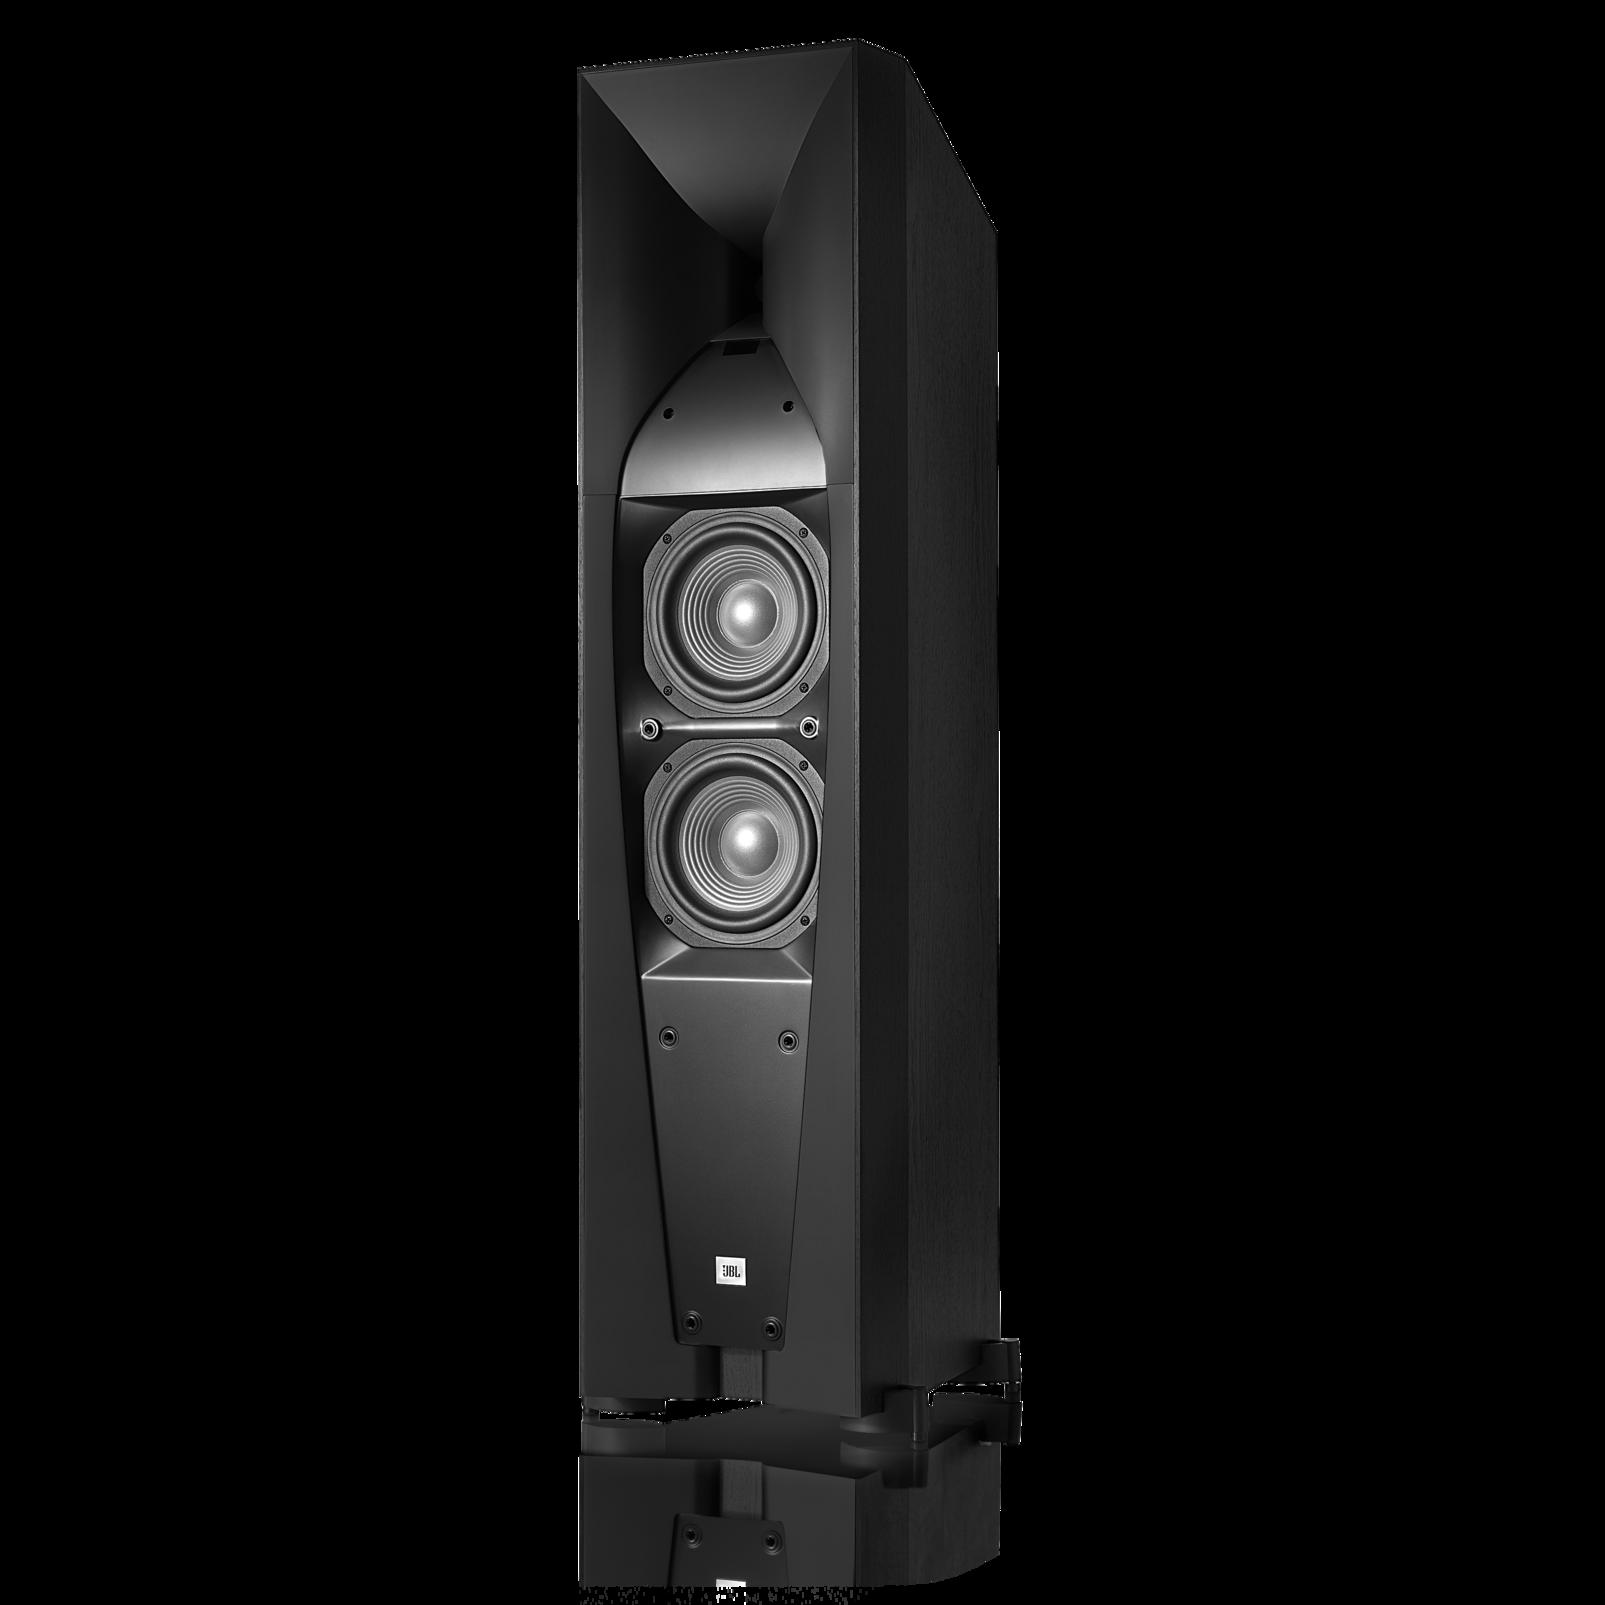 Studio 580 - Black - Professional-quality 200-watt Floorstanding Speaker - Detailshot 1